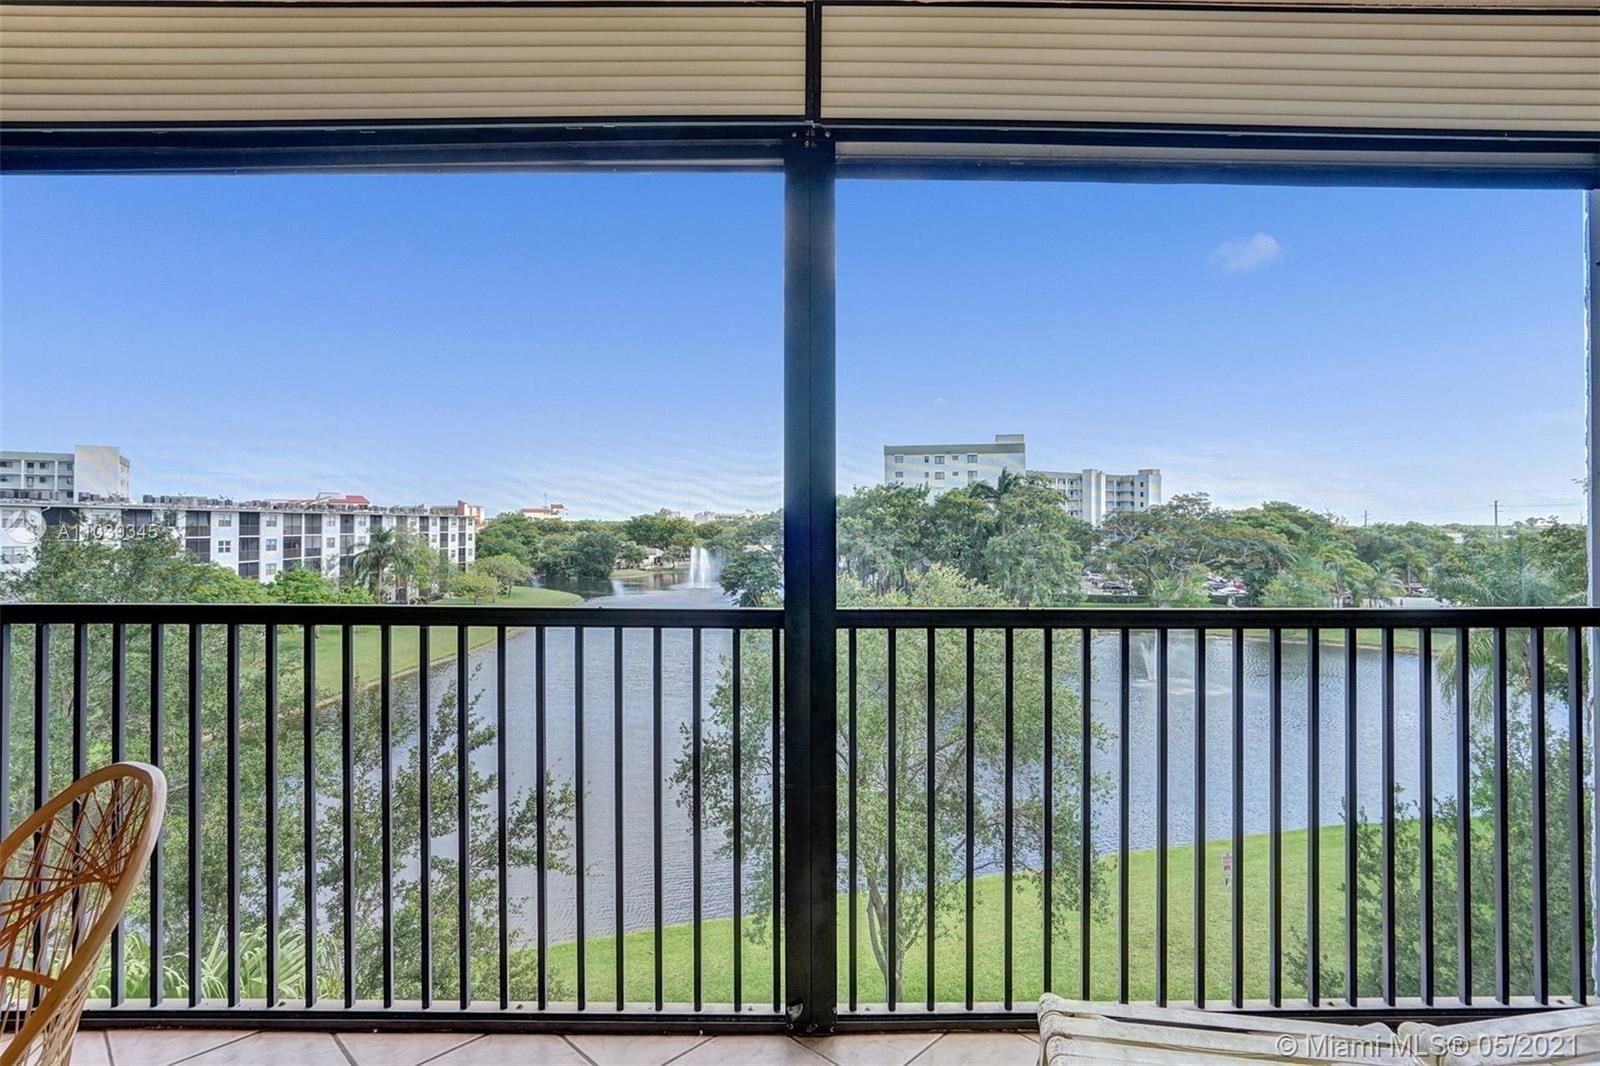 Photo of 2238 N Cypress Bend Dr #507, Pompano Beach, FL 33069 (MLS # A11039345)